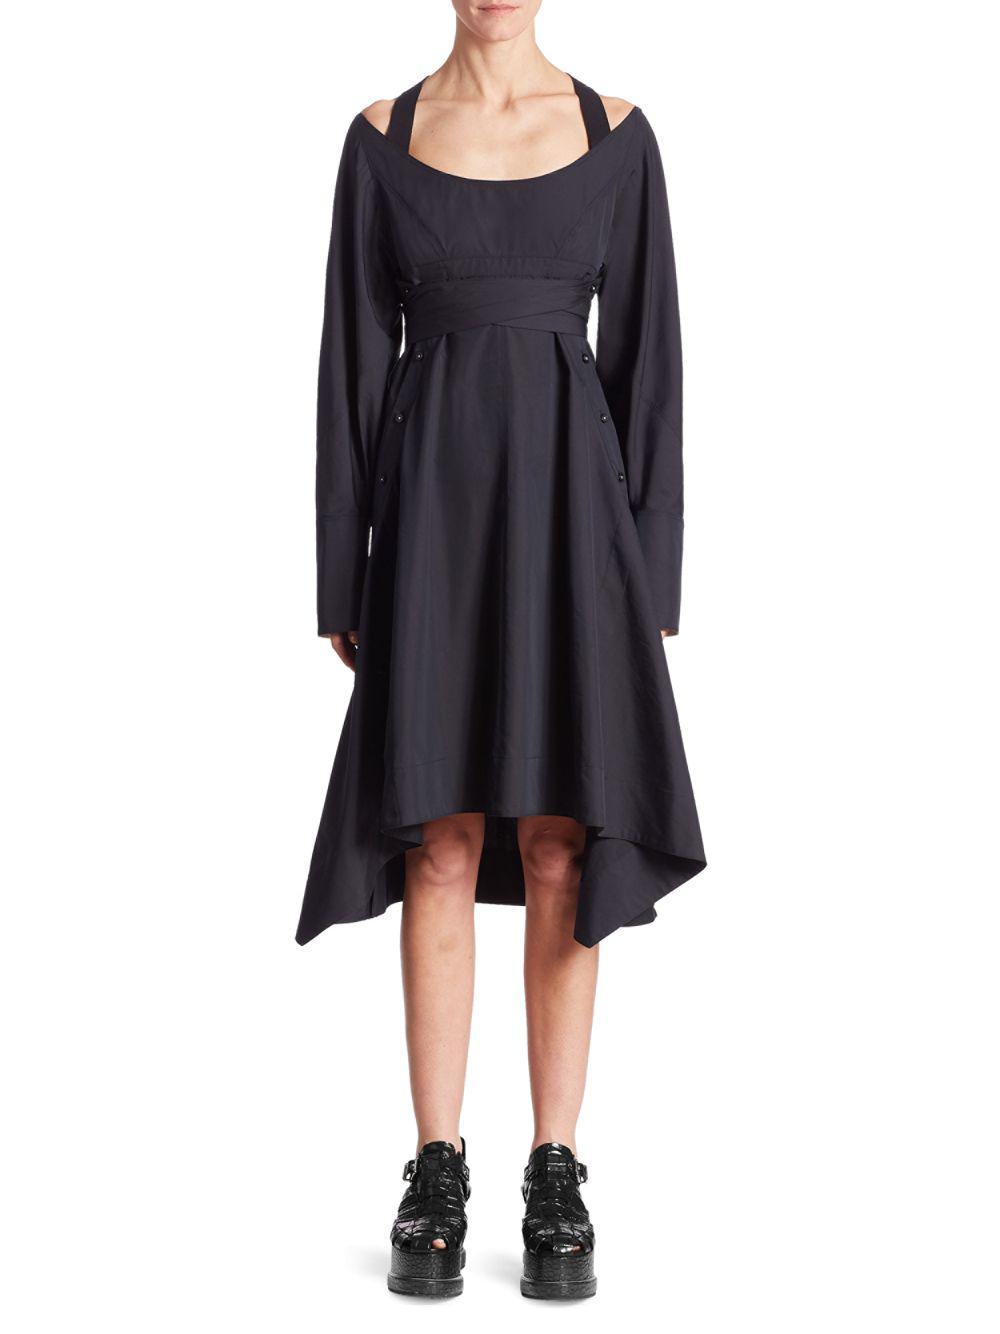 Proenza Schouler Woman Tie-back Layered Crepe Mini Dress Black Size 0 Proenza Schouler IF5JBpSZ